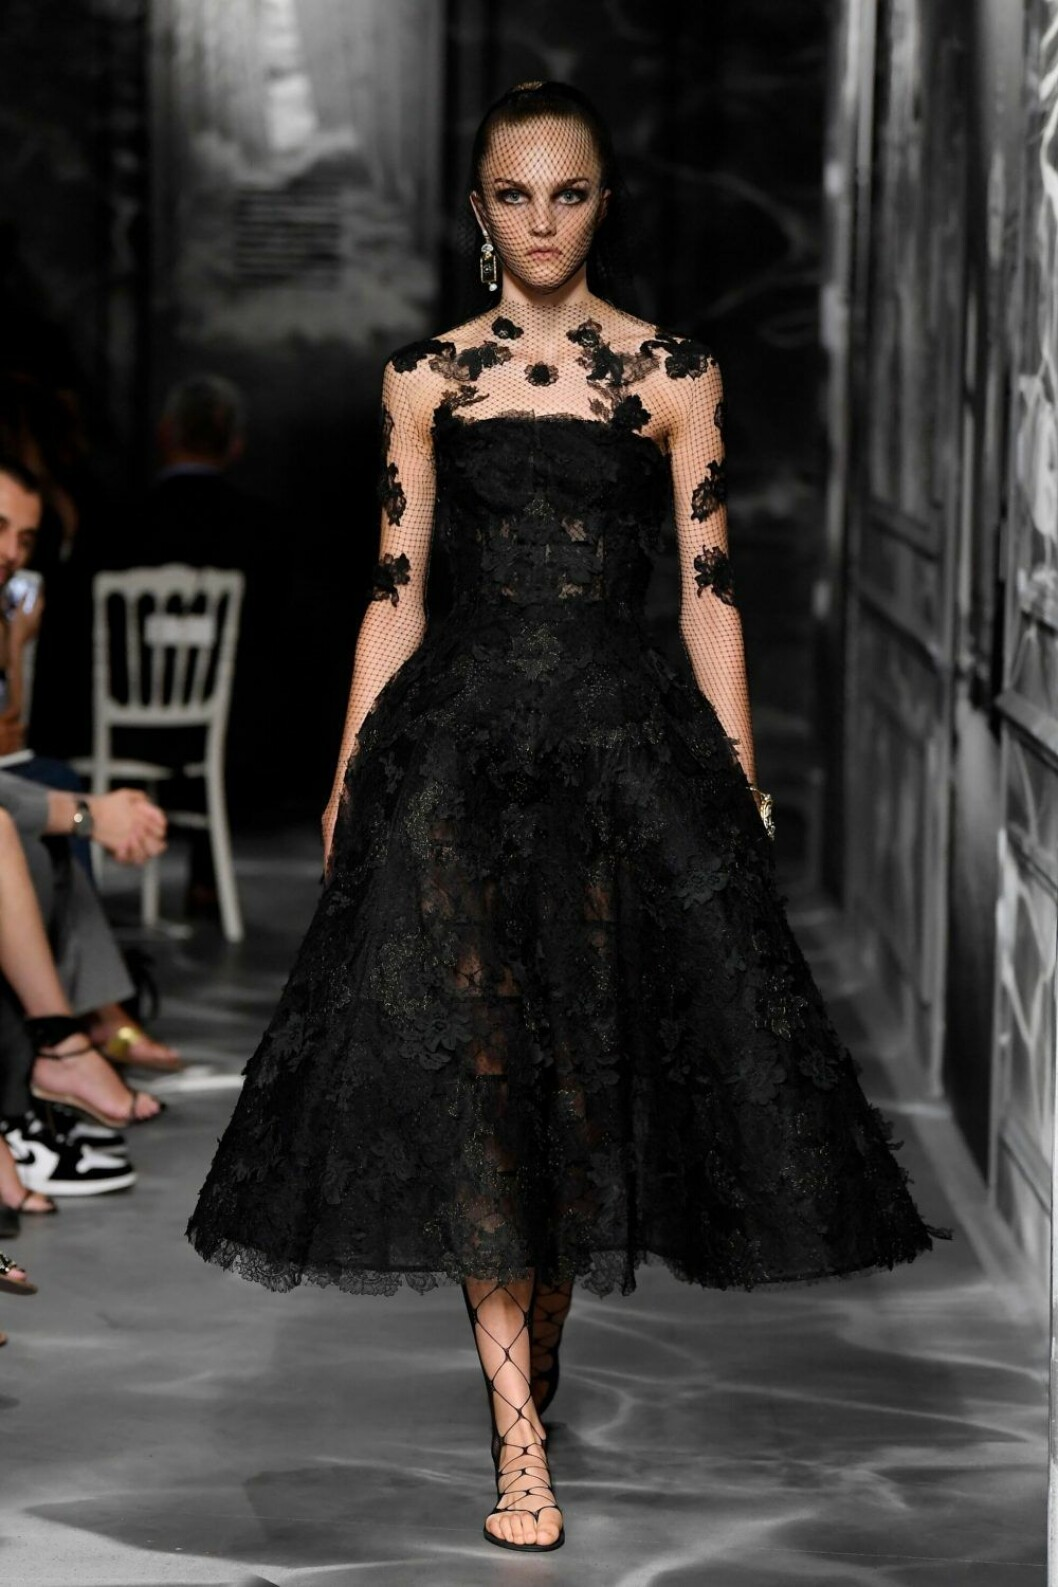 Christian Dior AW19/20 svart look med broderade detaljer.